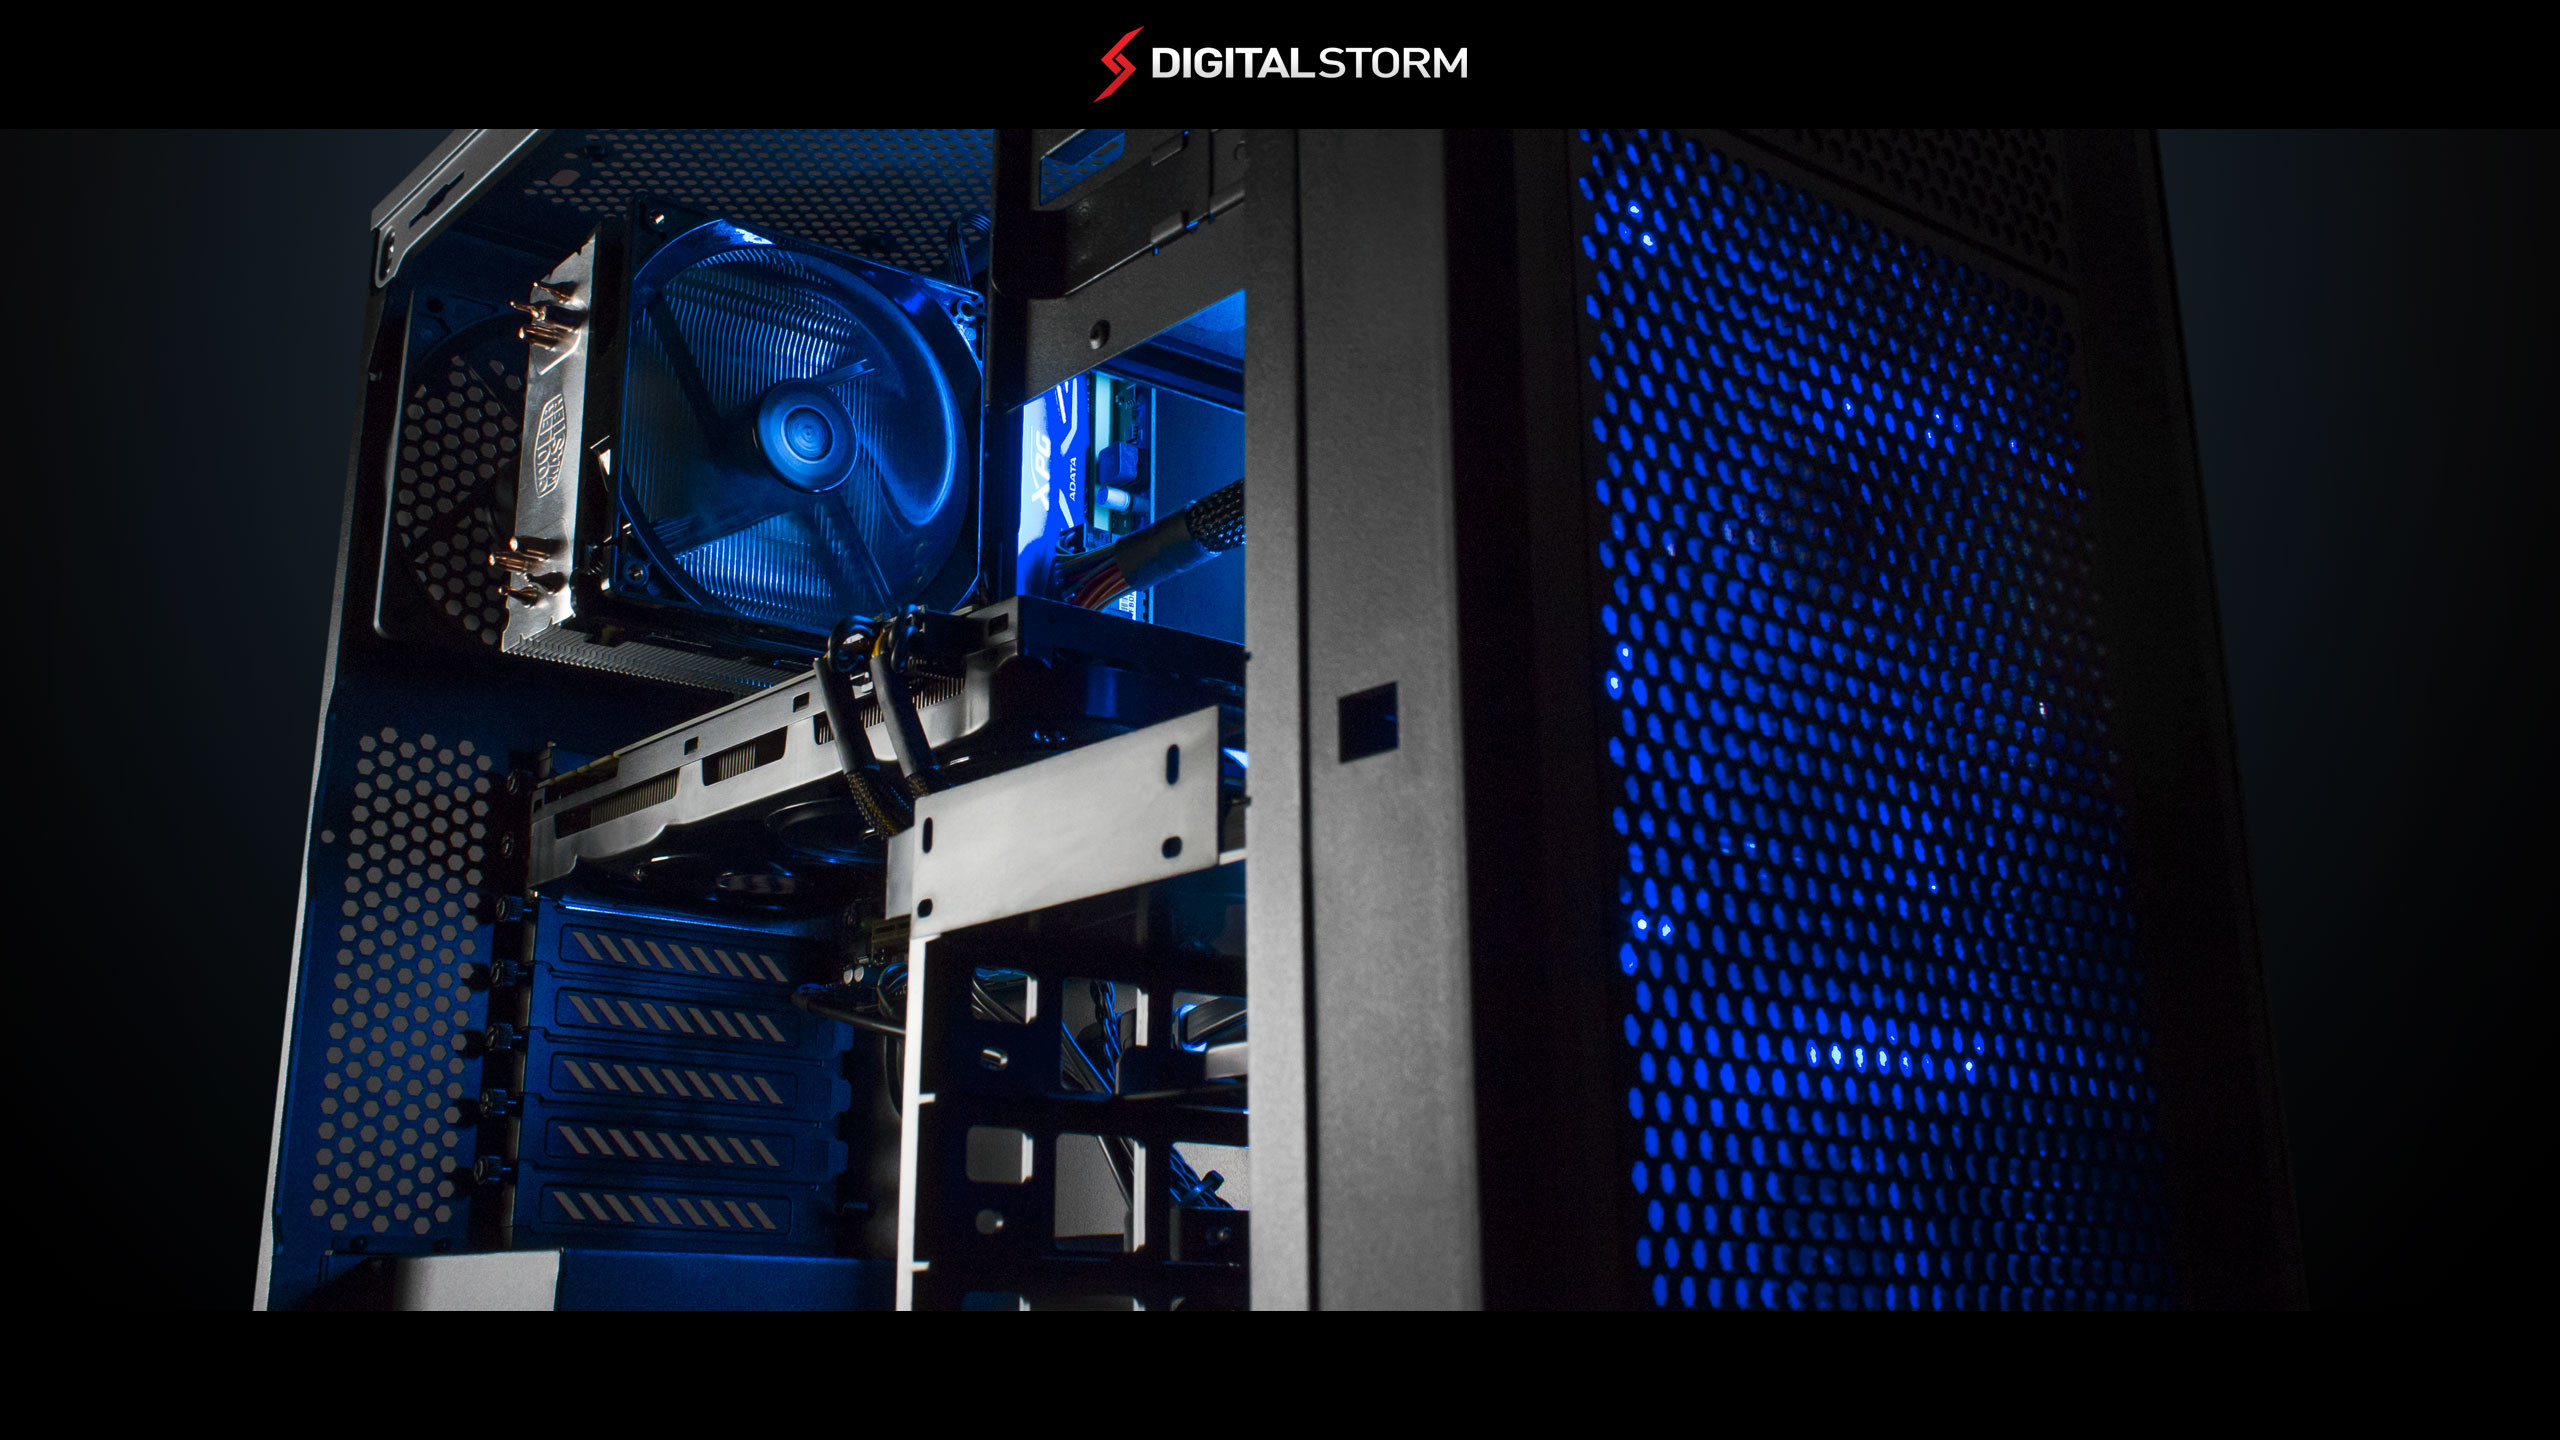 f. Digital Storm Blue Dominance Wallpaper